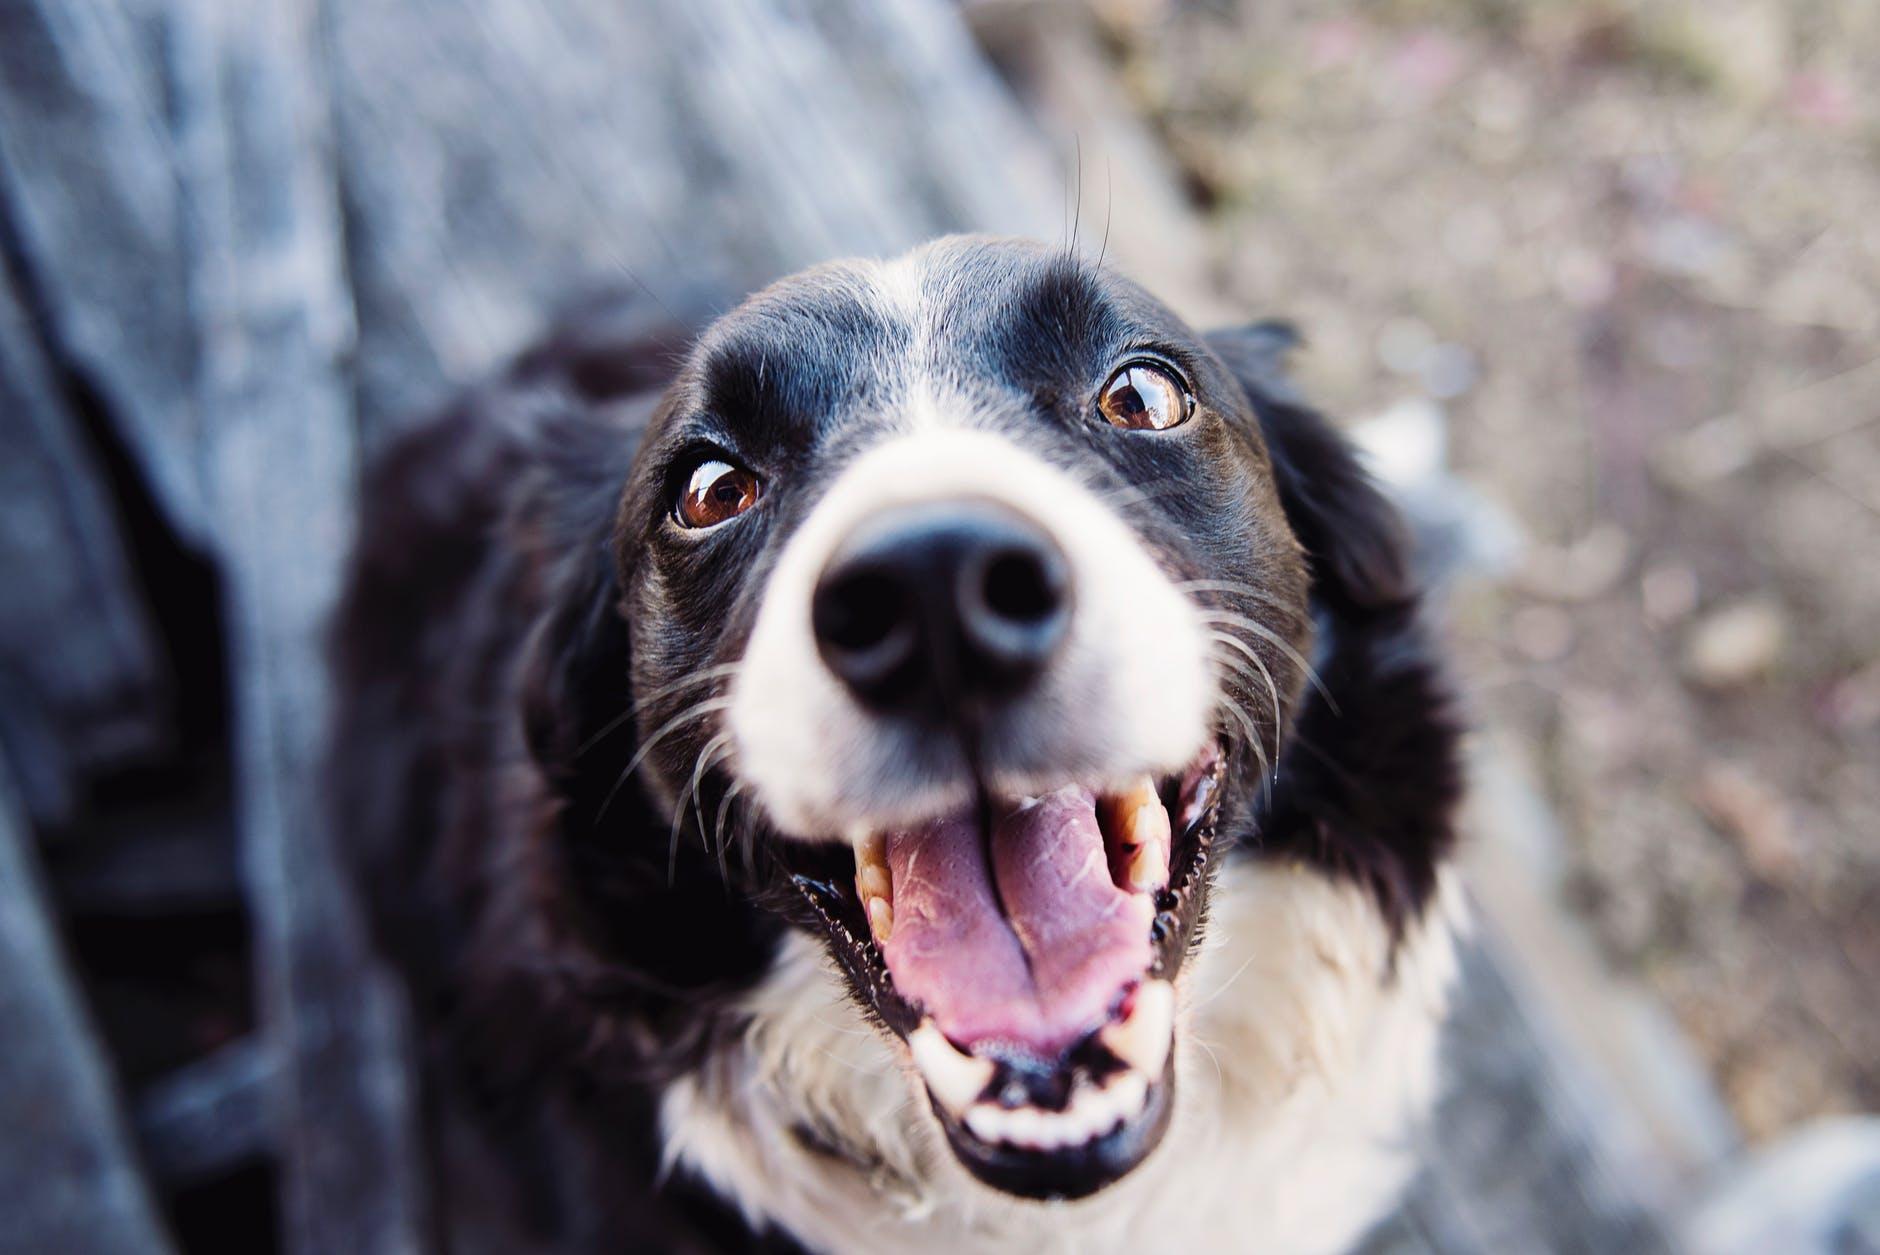 animal blur canine close up